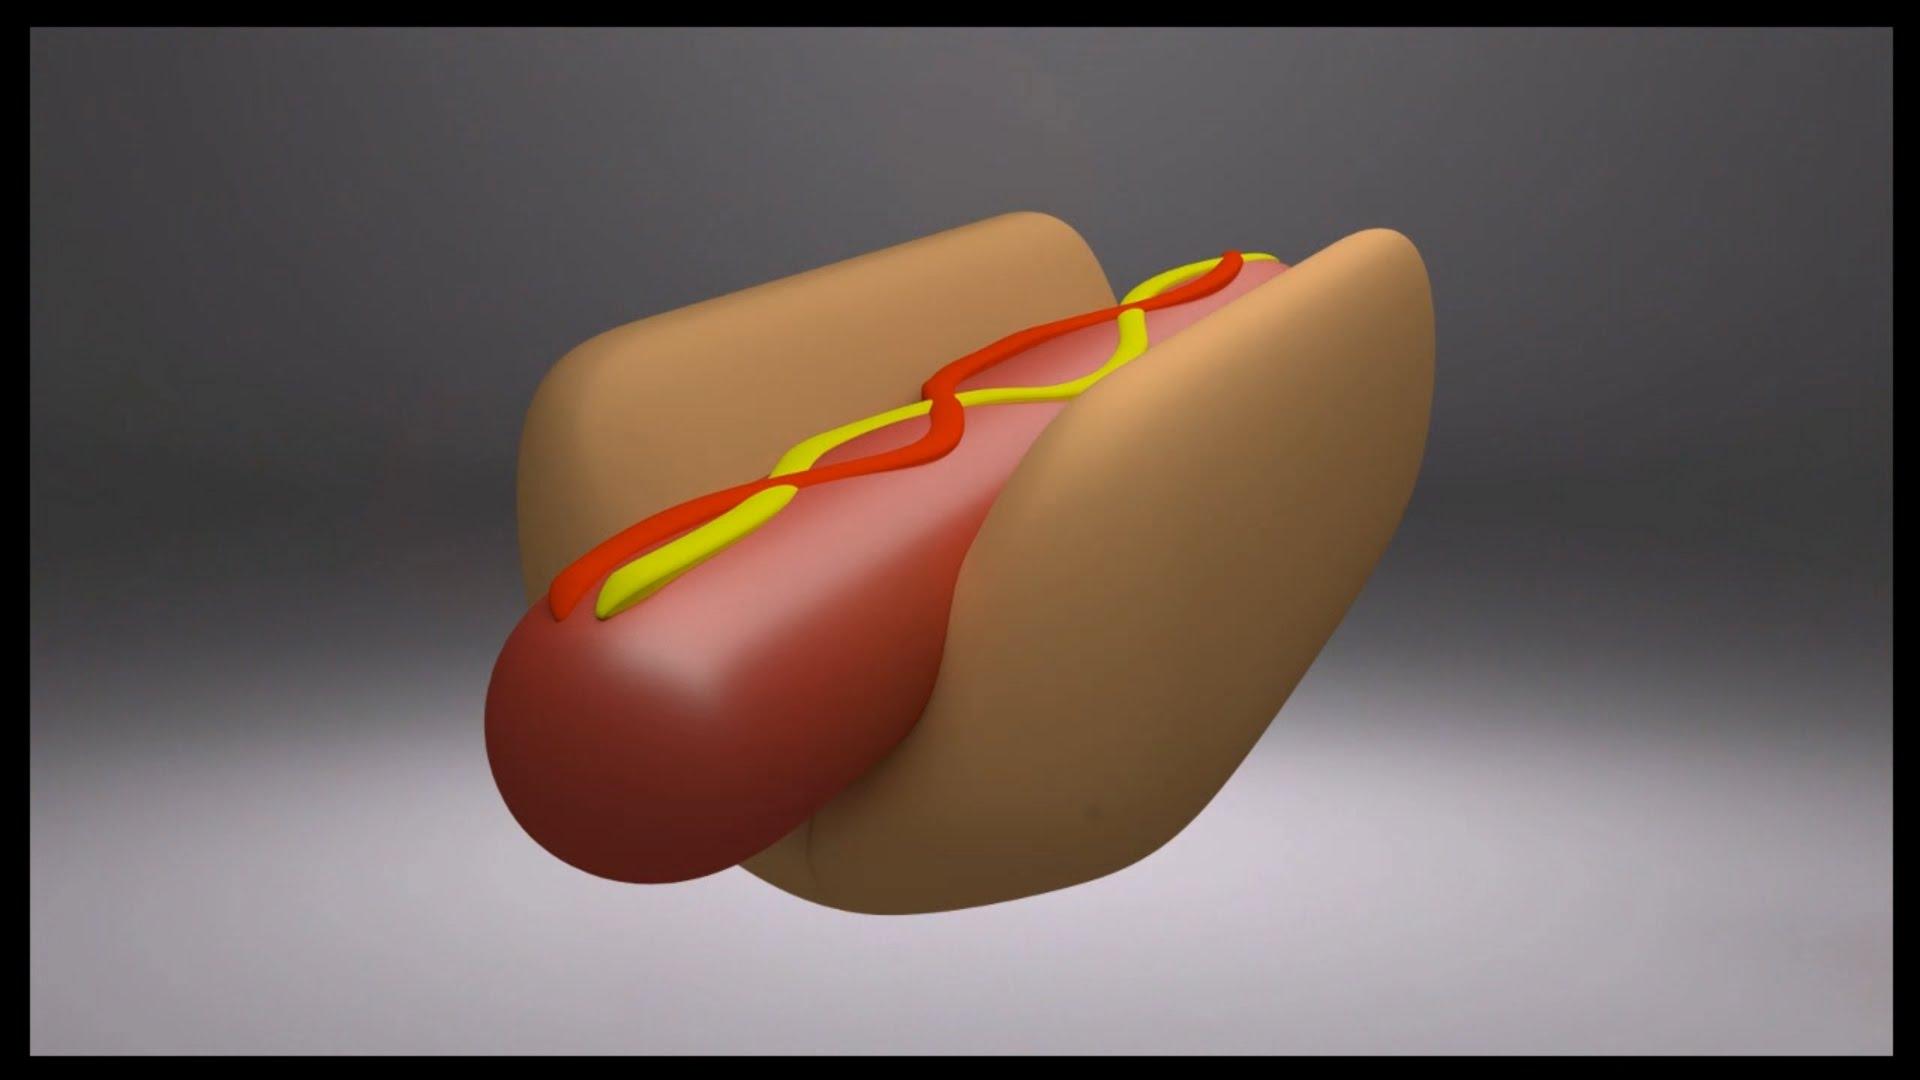 Cartoon Hot Dog - Blender ( time lapse )